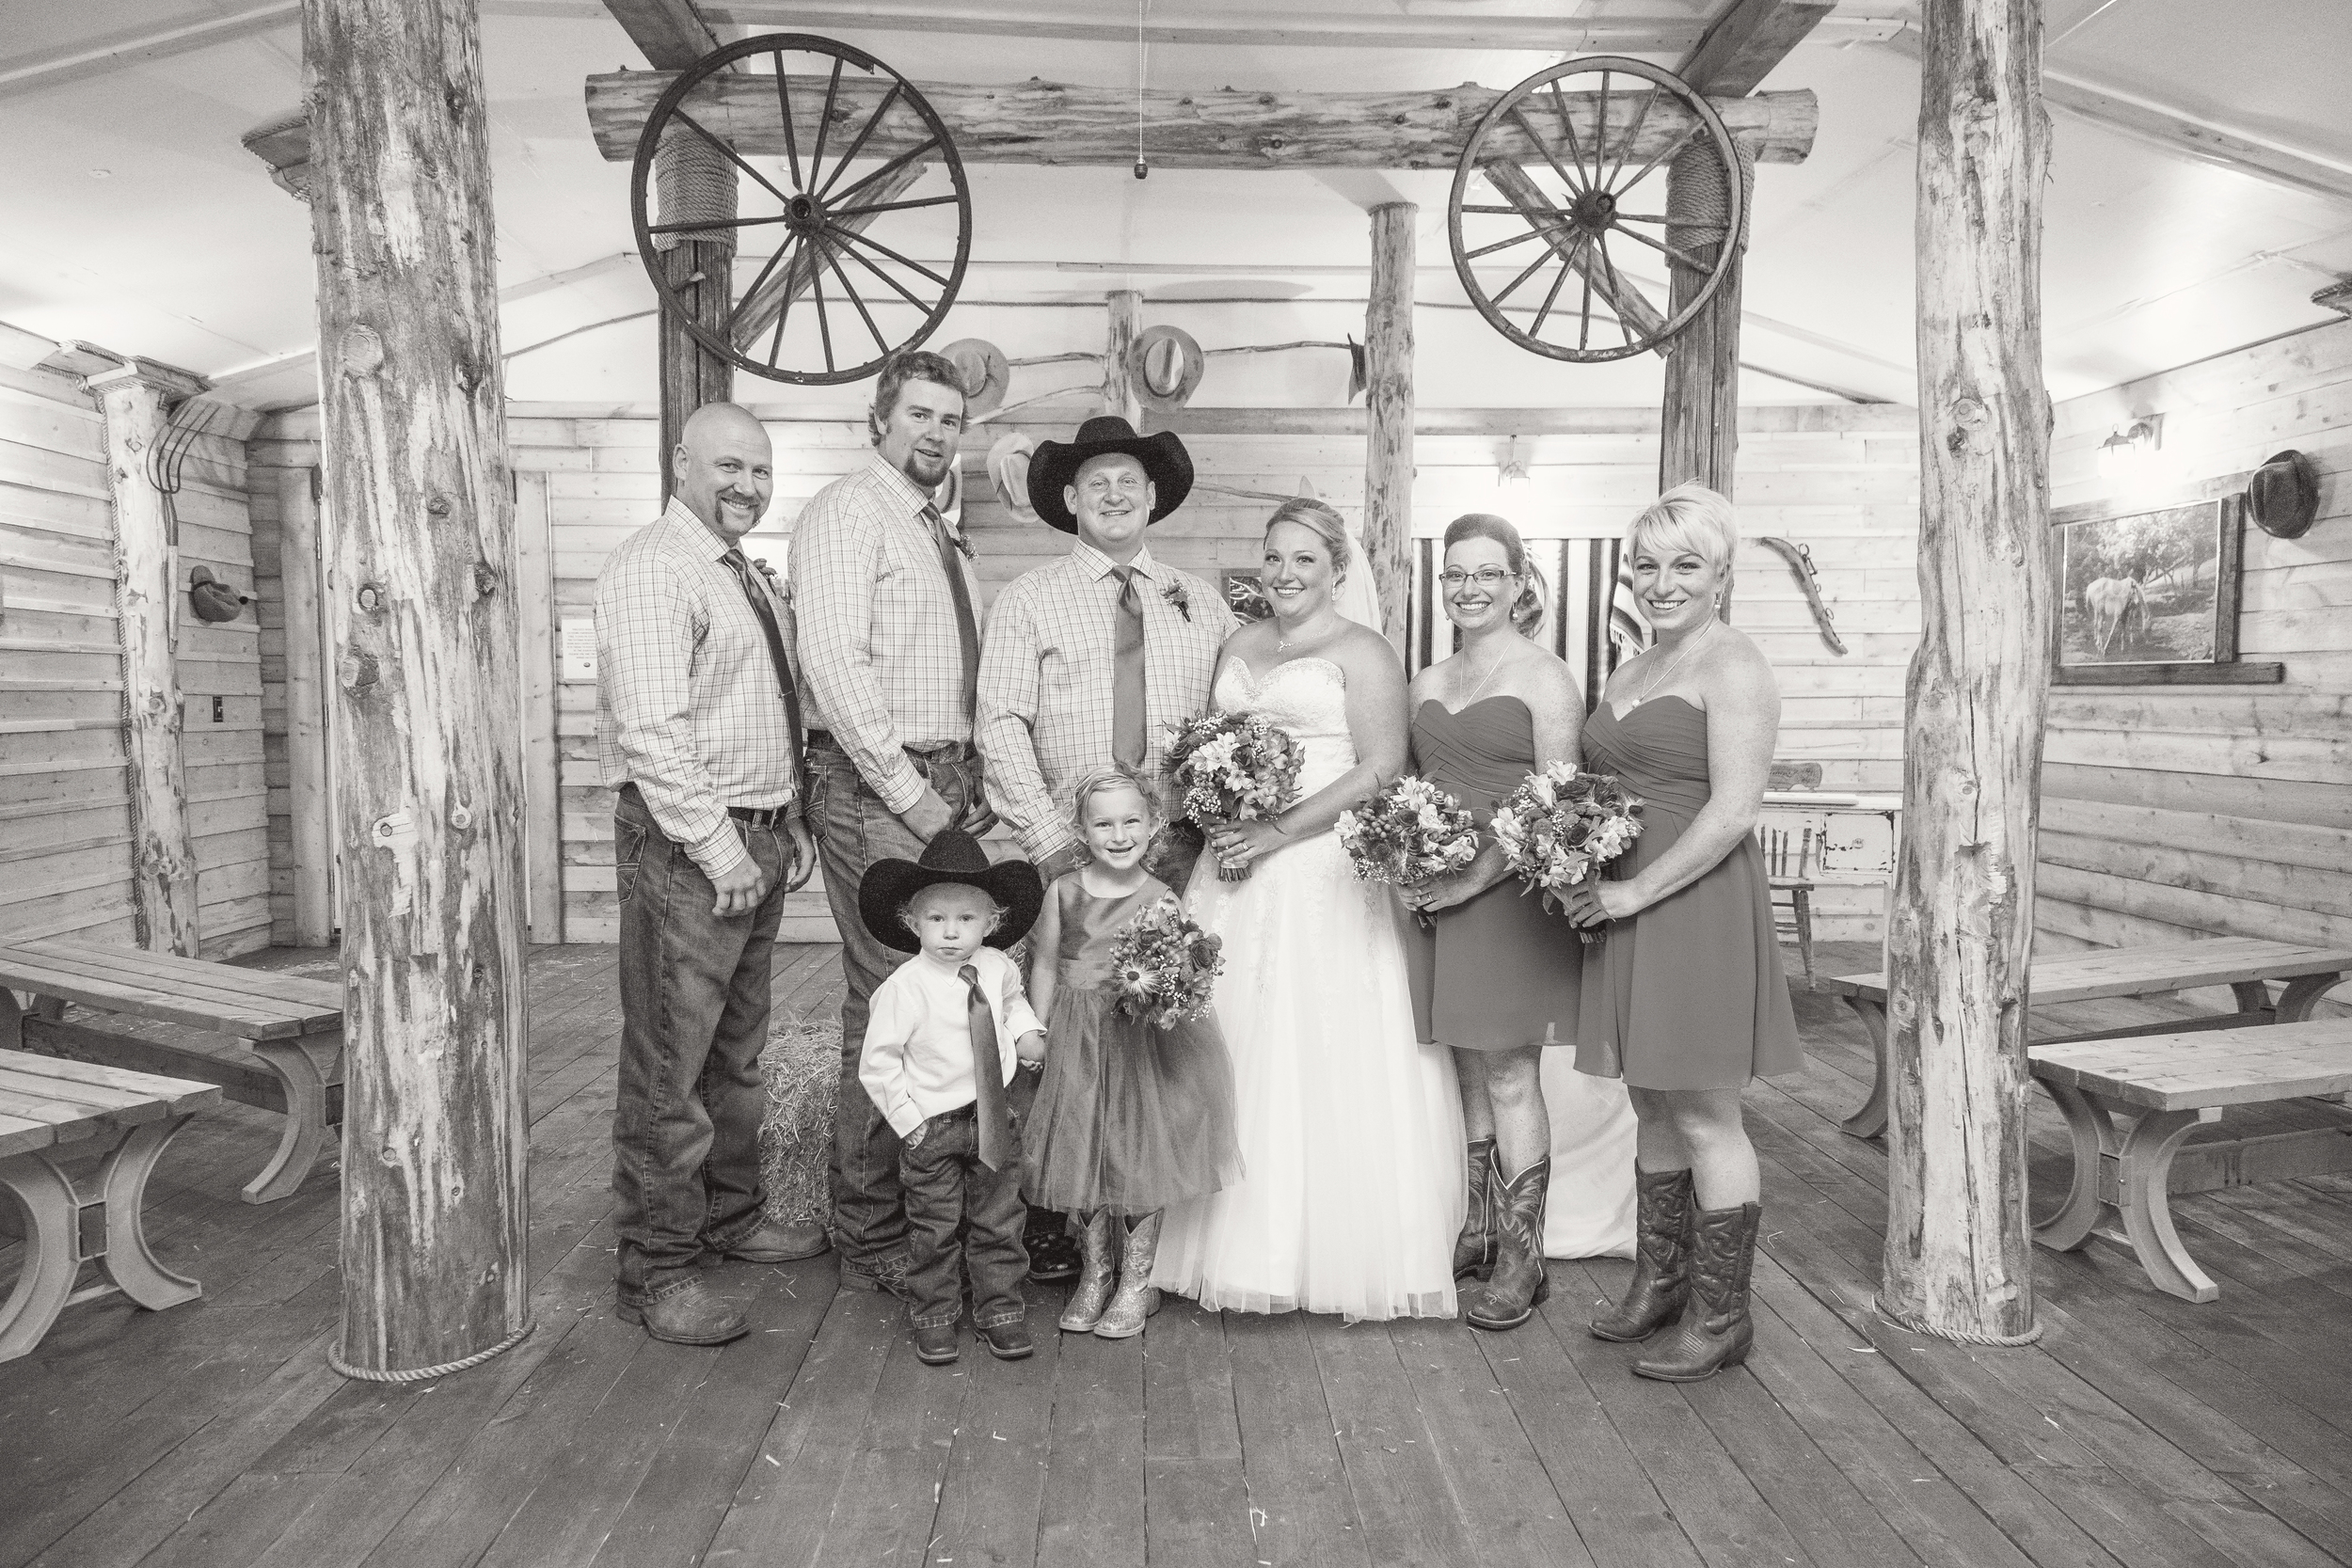 CS_Wedding_14-08-23_186_bw.jpg